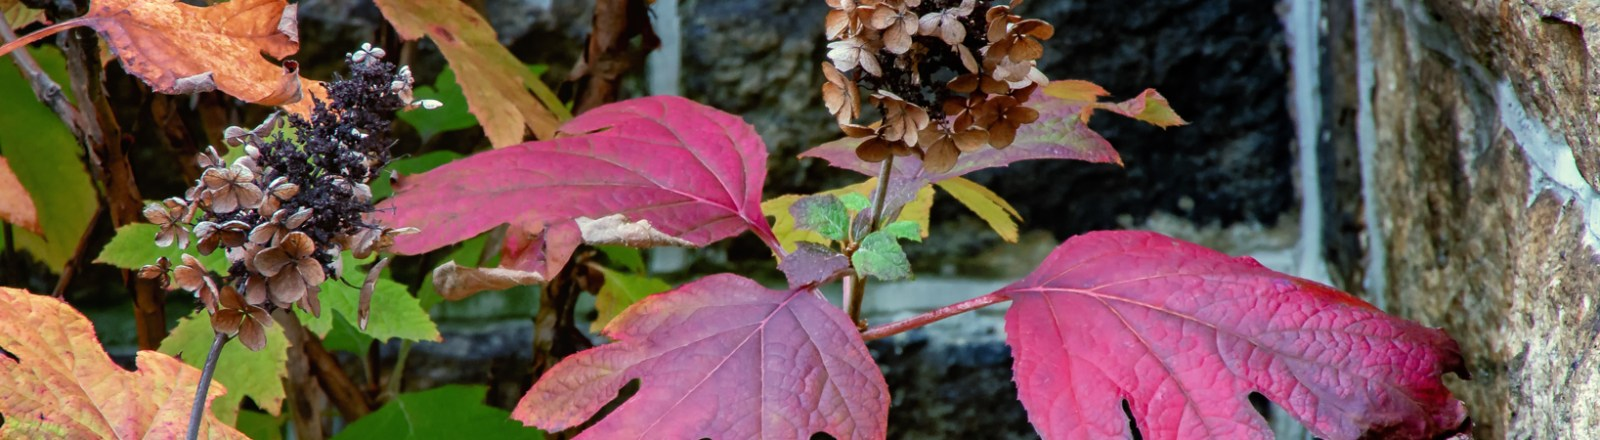 Autumn in Atlanta: Photo Mash-Up #4